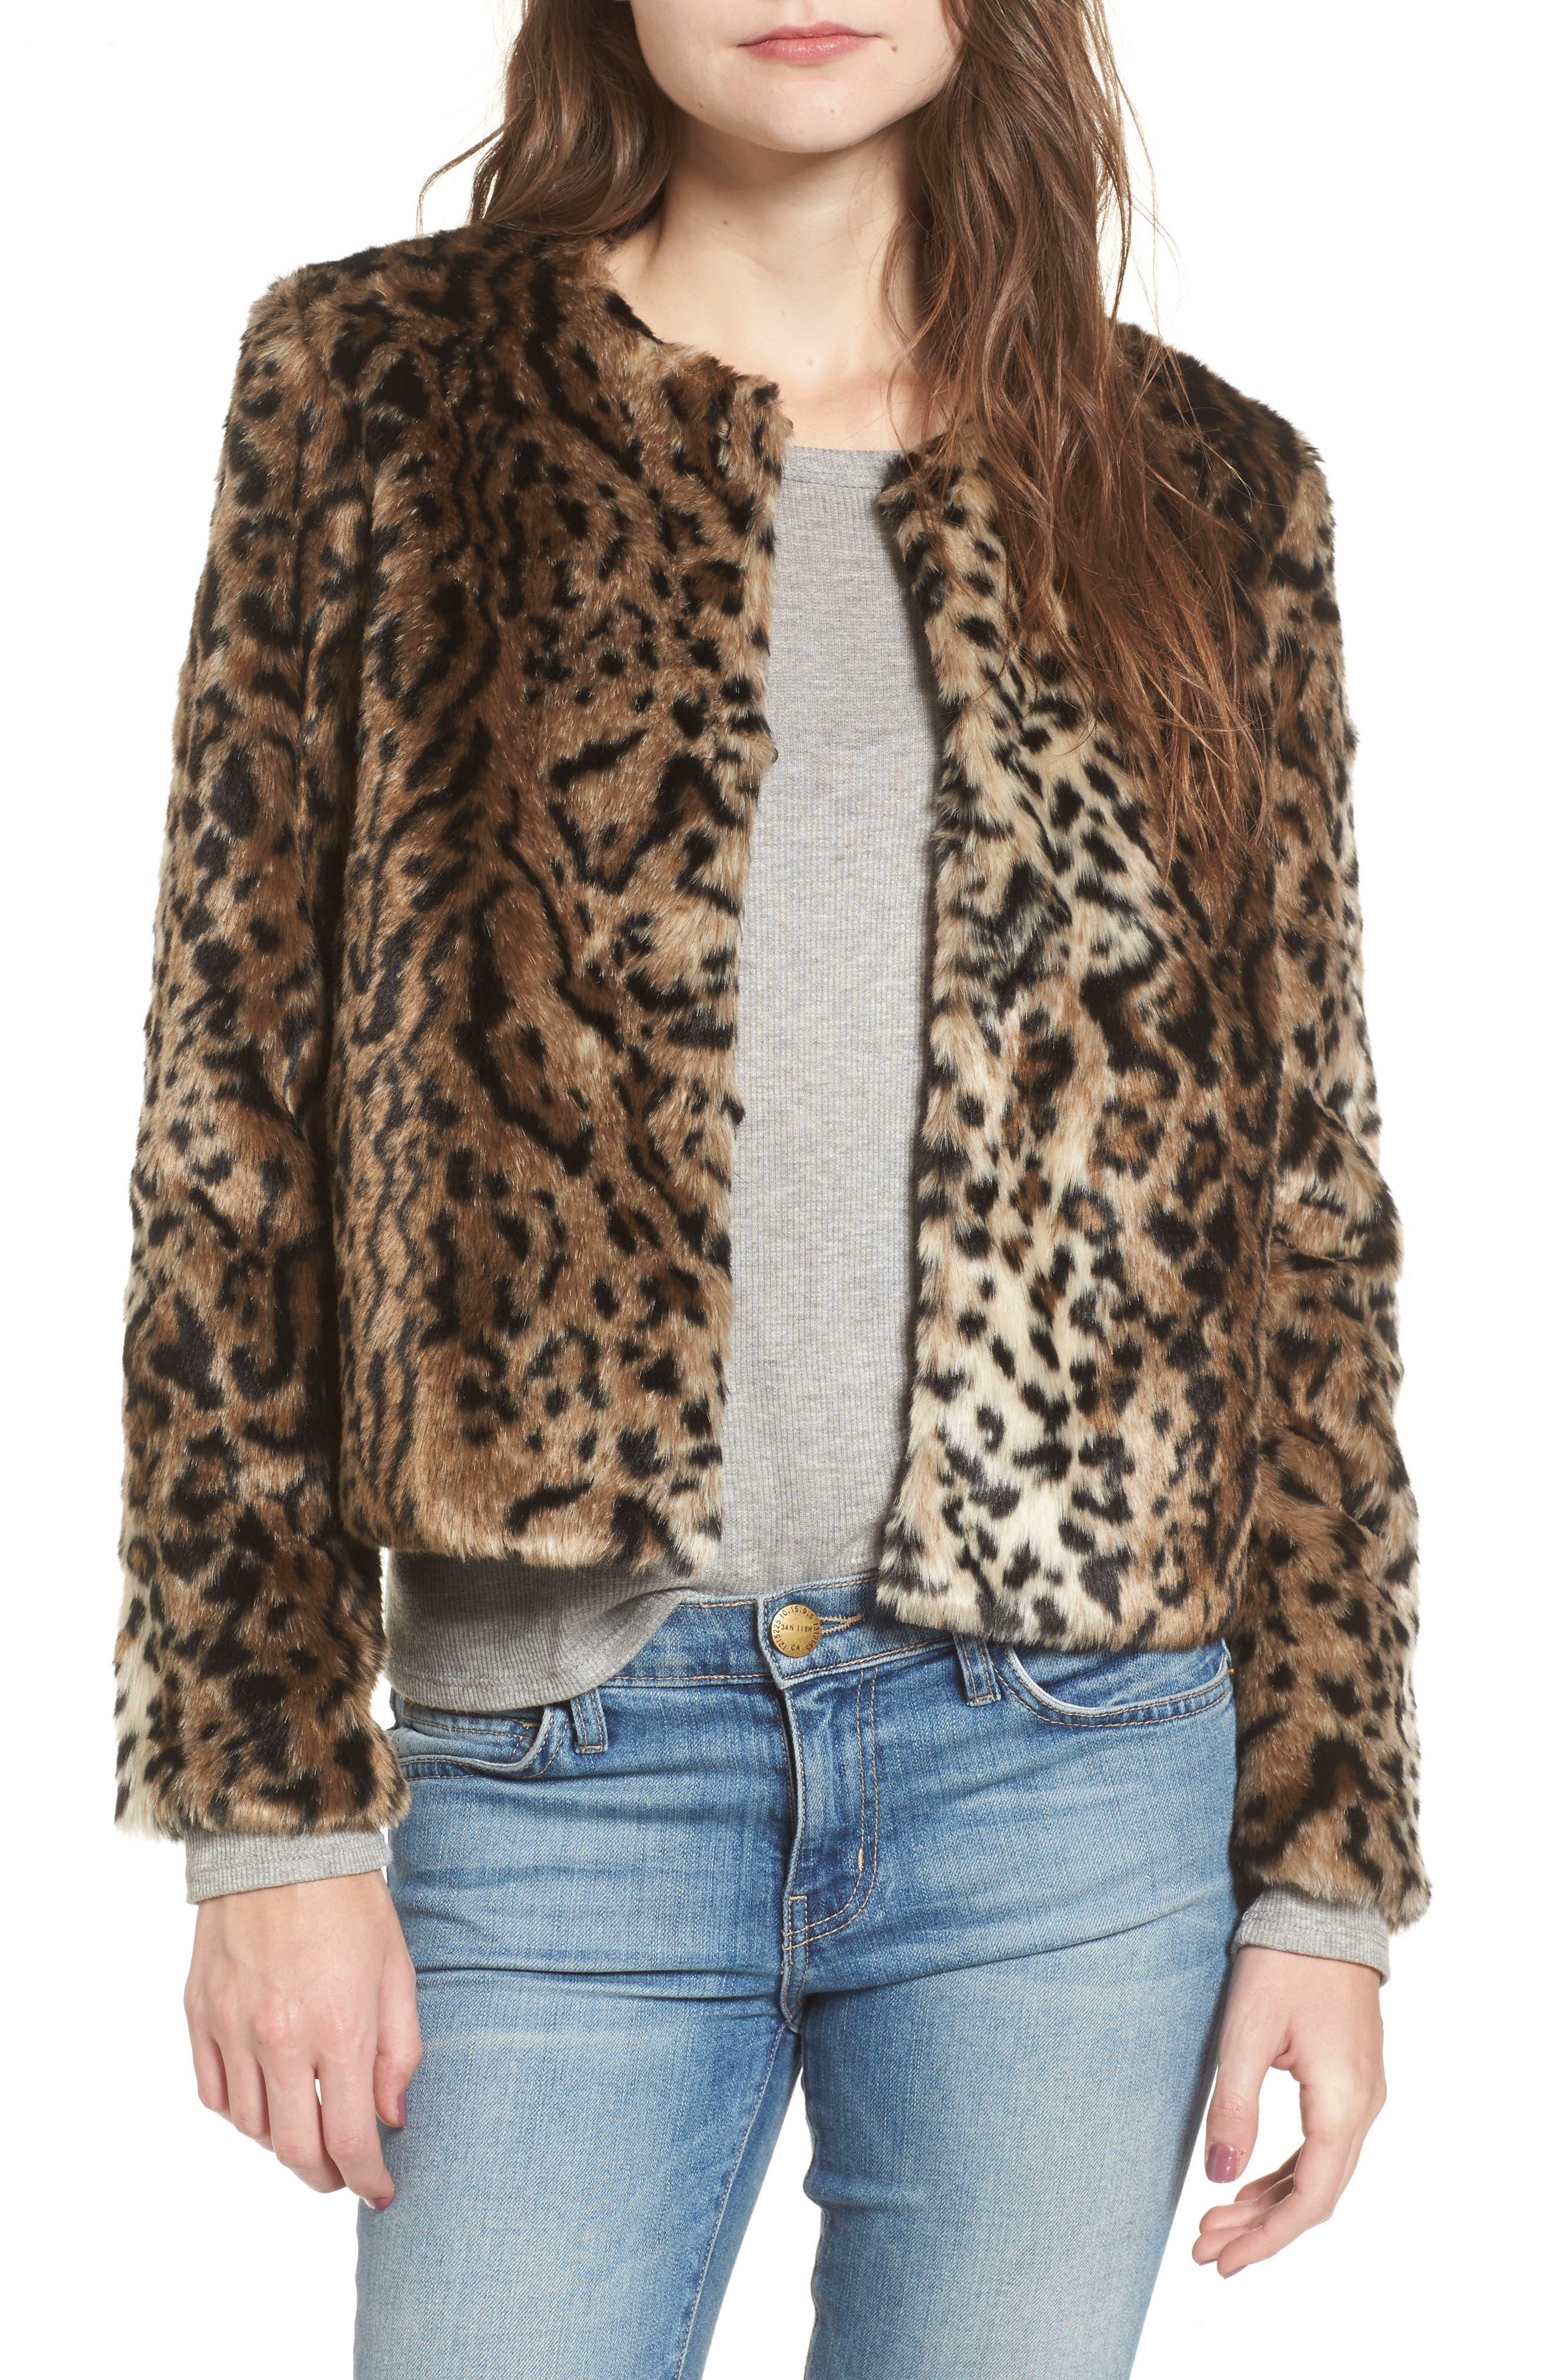 Main Image - BB Dakota McKinley Leopard Print Faux Fur Jacket